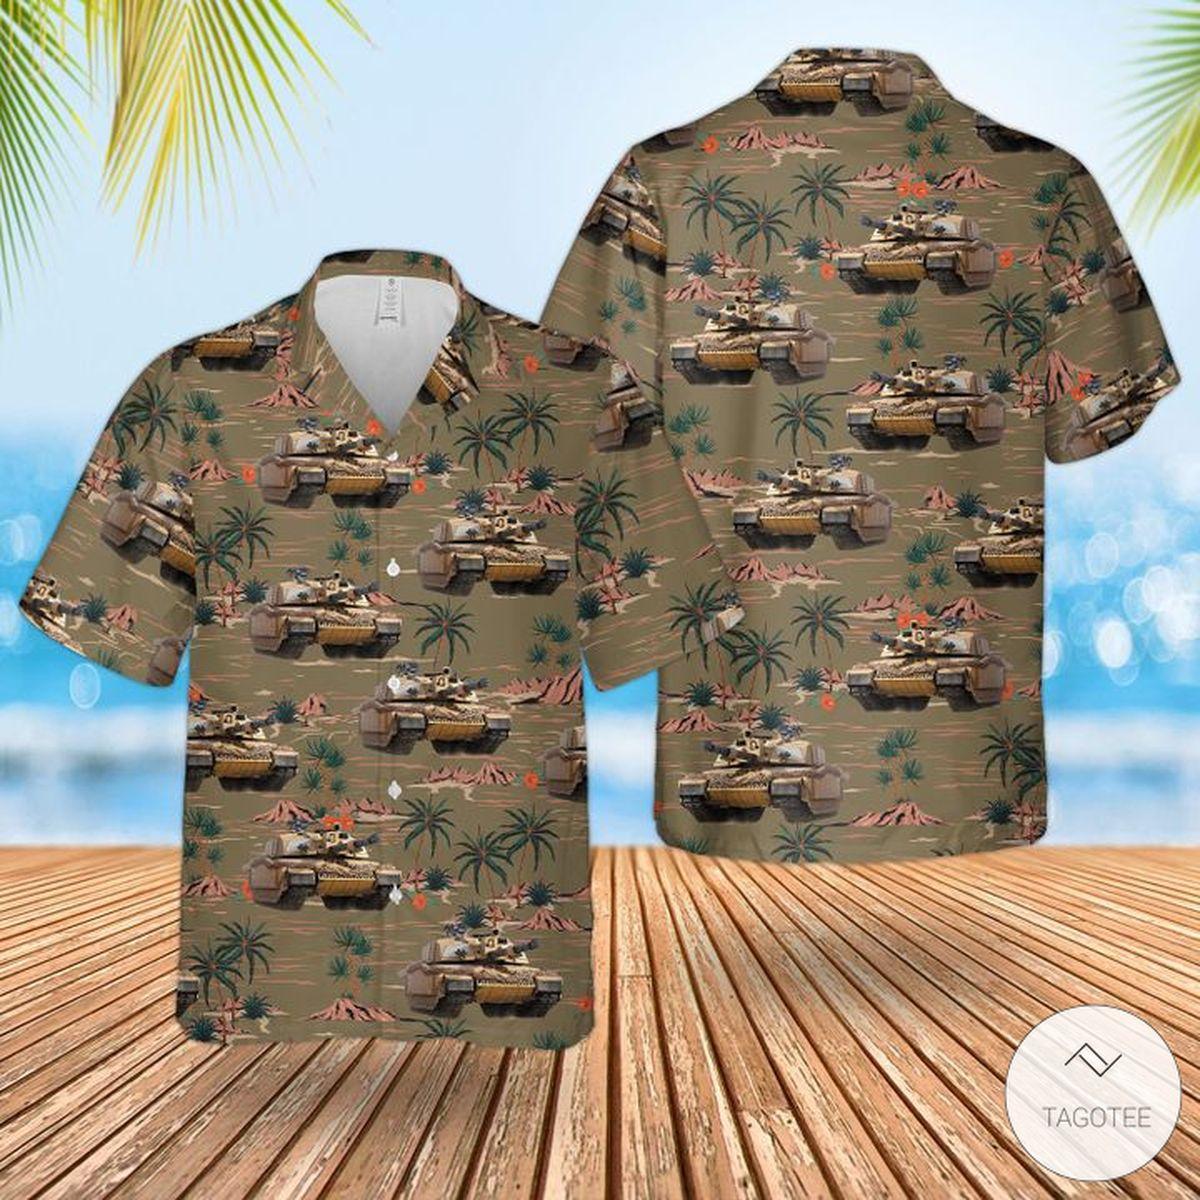 Great Quality British Army Challenger 2 Combat Vehicle Hawaiian Shirt, Beach Shorts